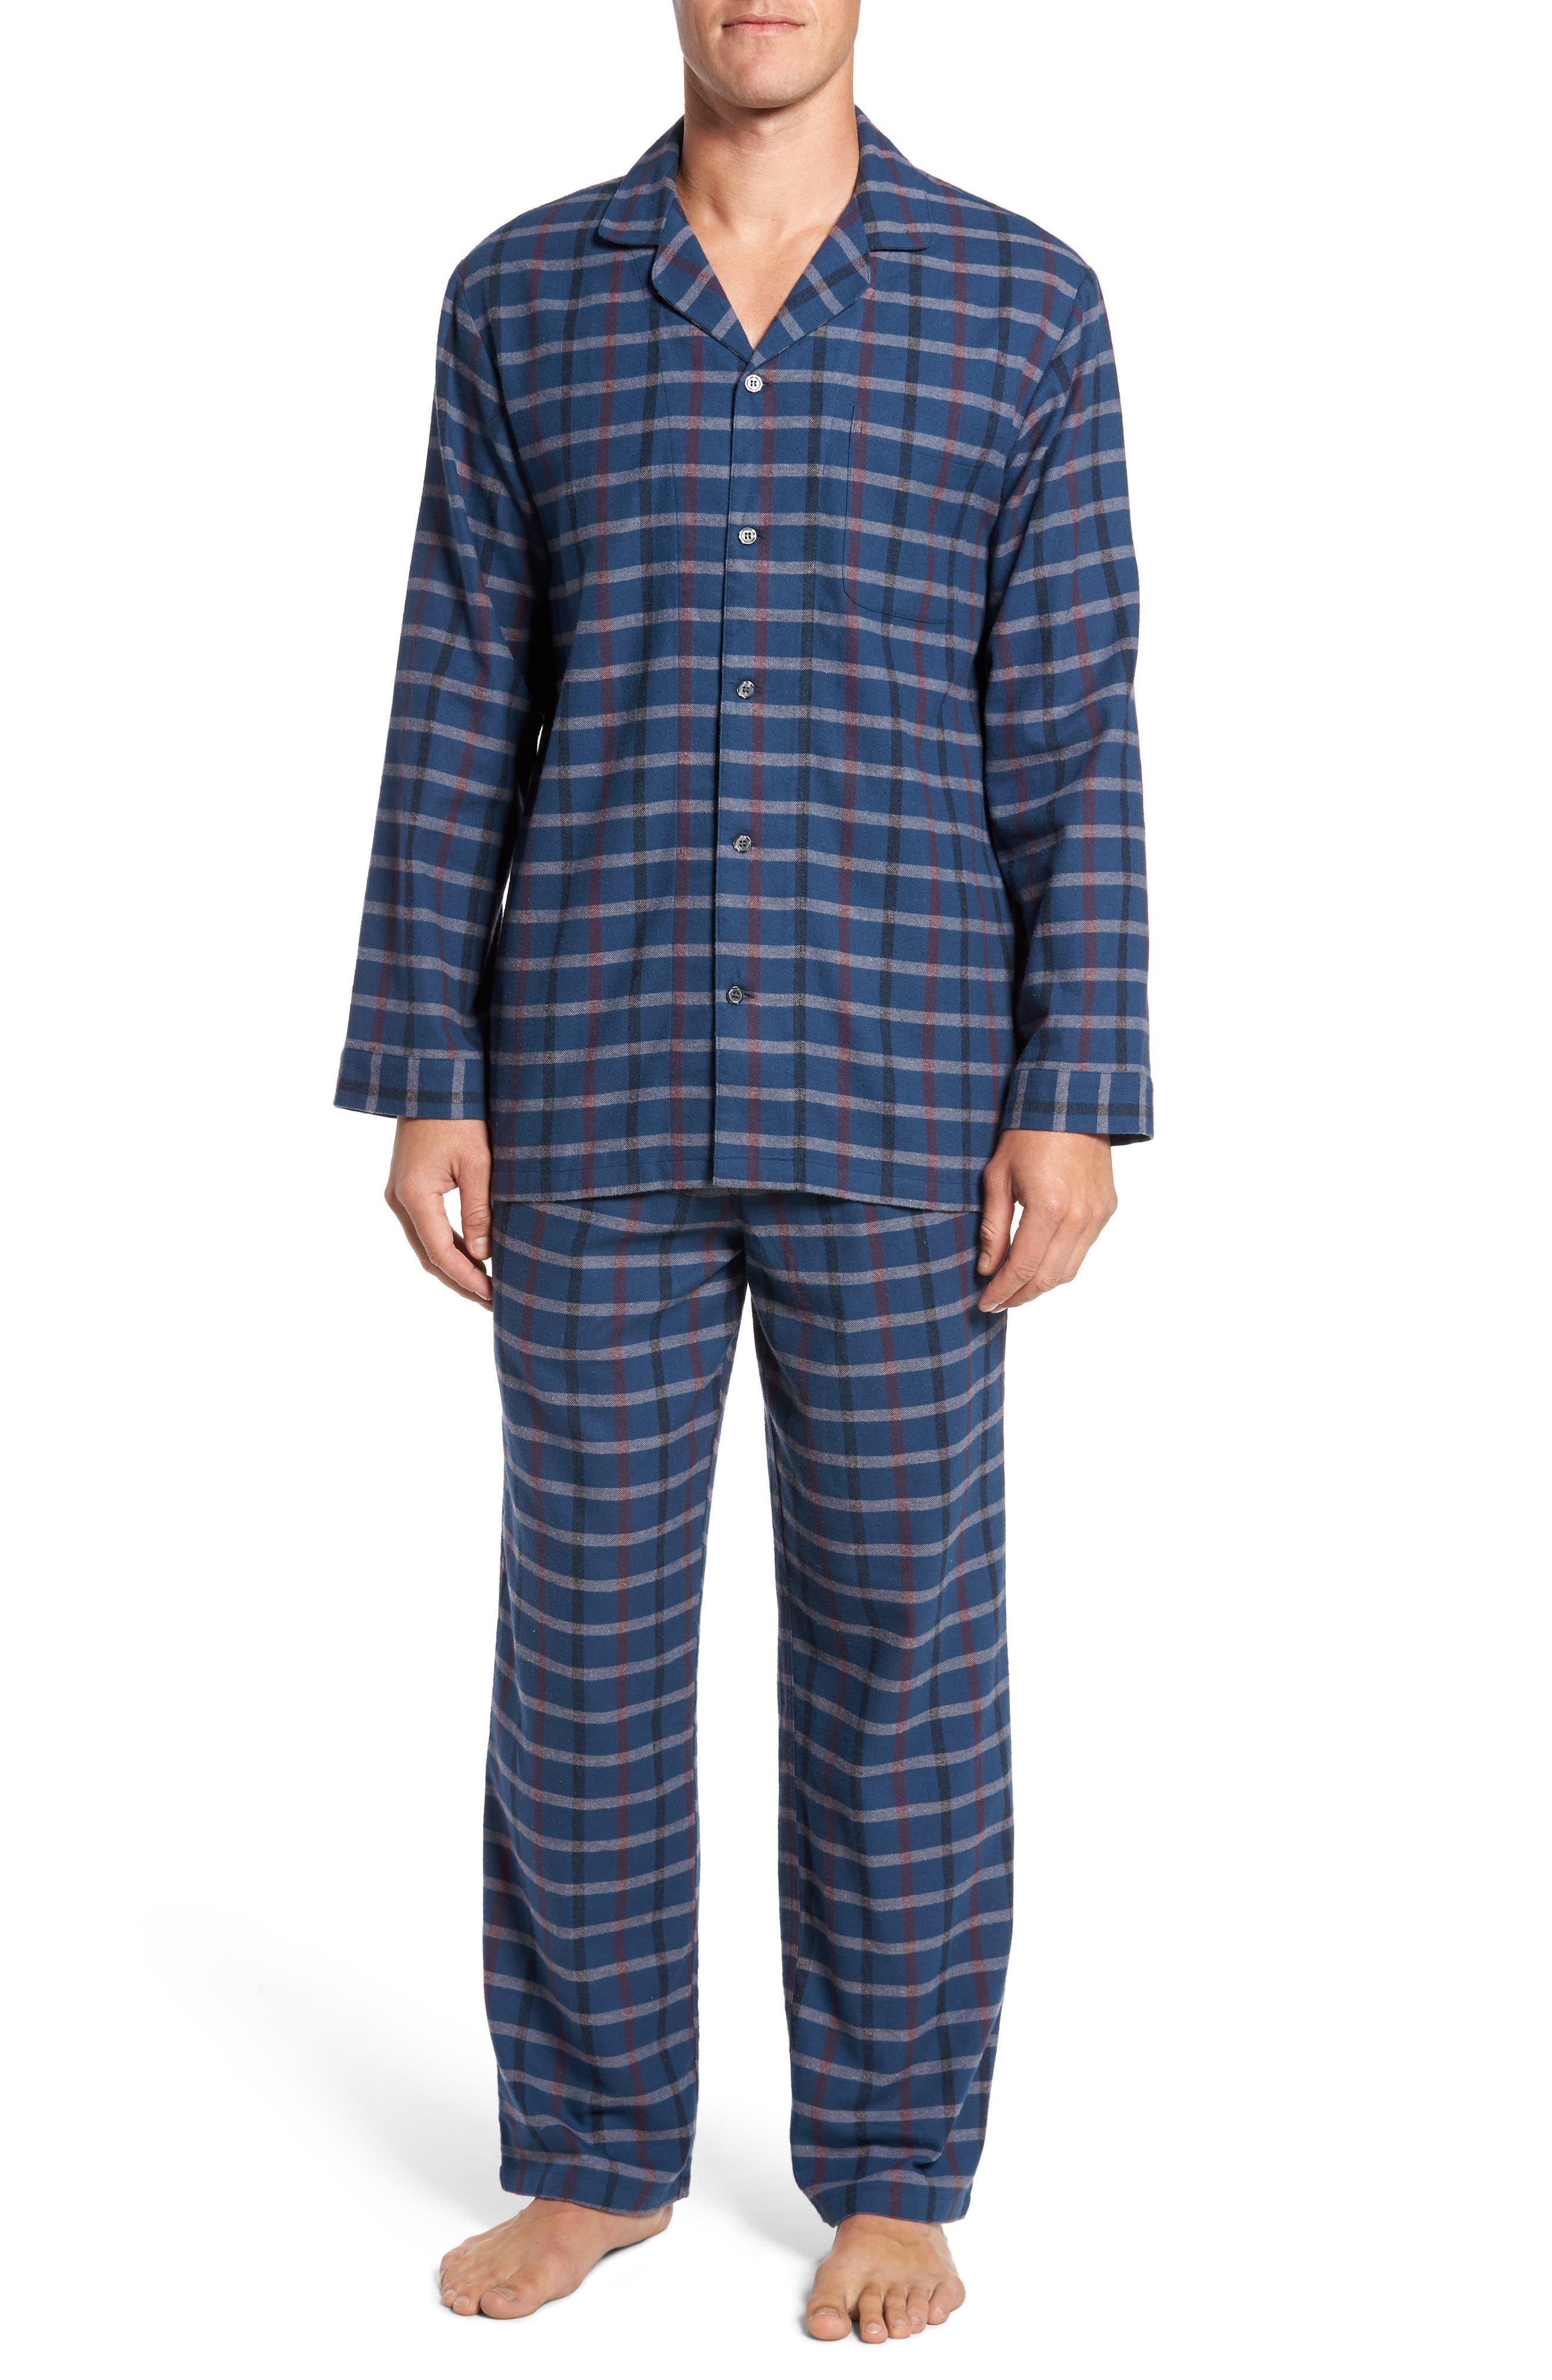 '824' Flannel Pajama Set,                         Main,                         color, Blue Ensign- Grey Check